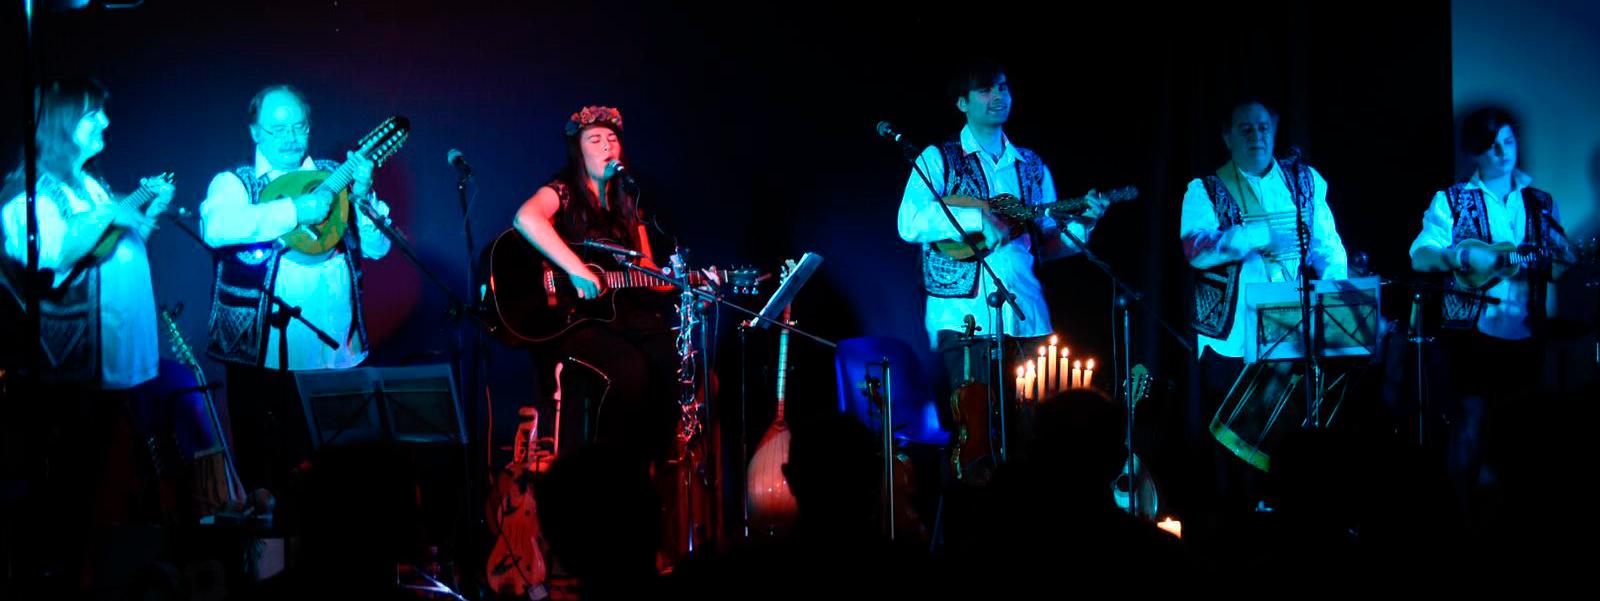 Amalgama, grupo de música folk